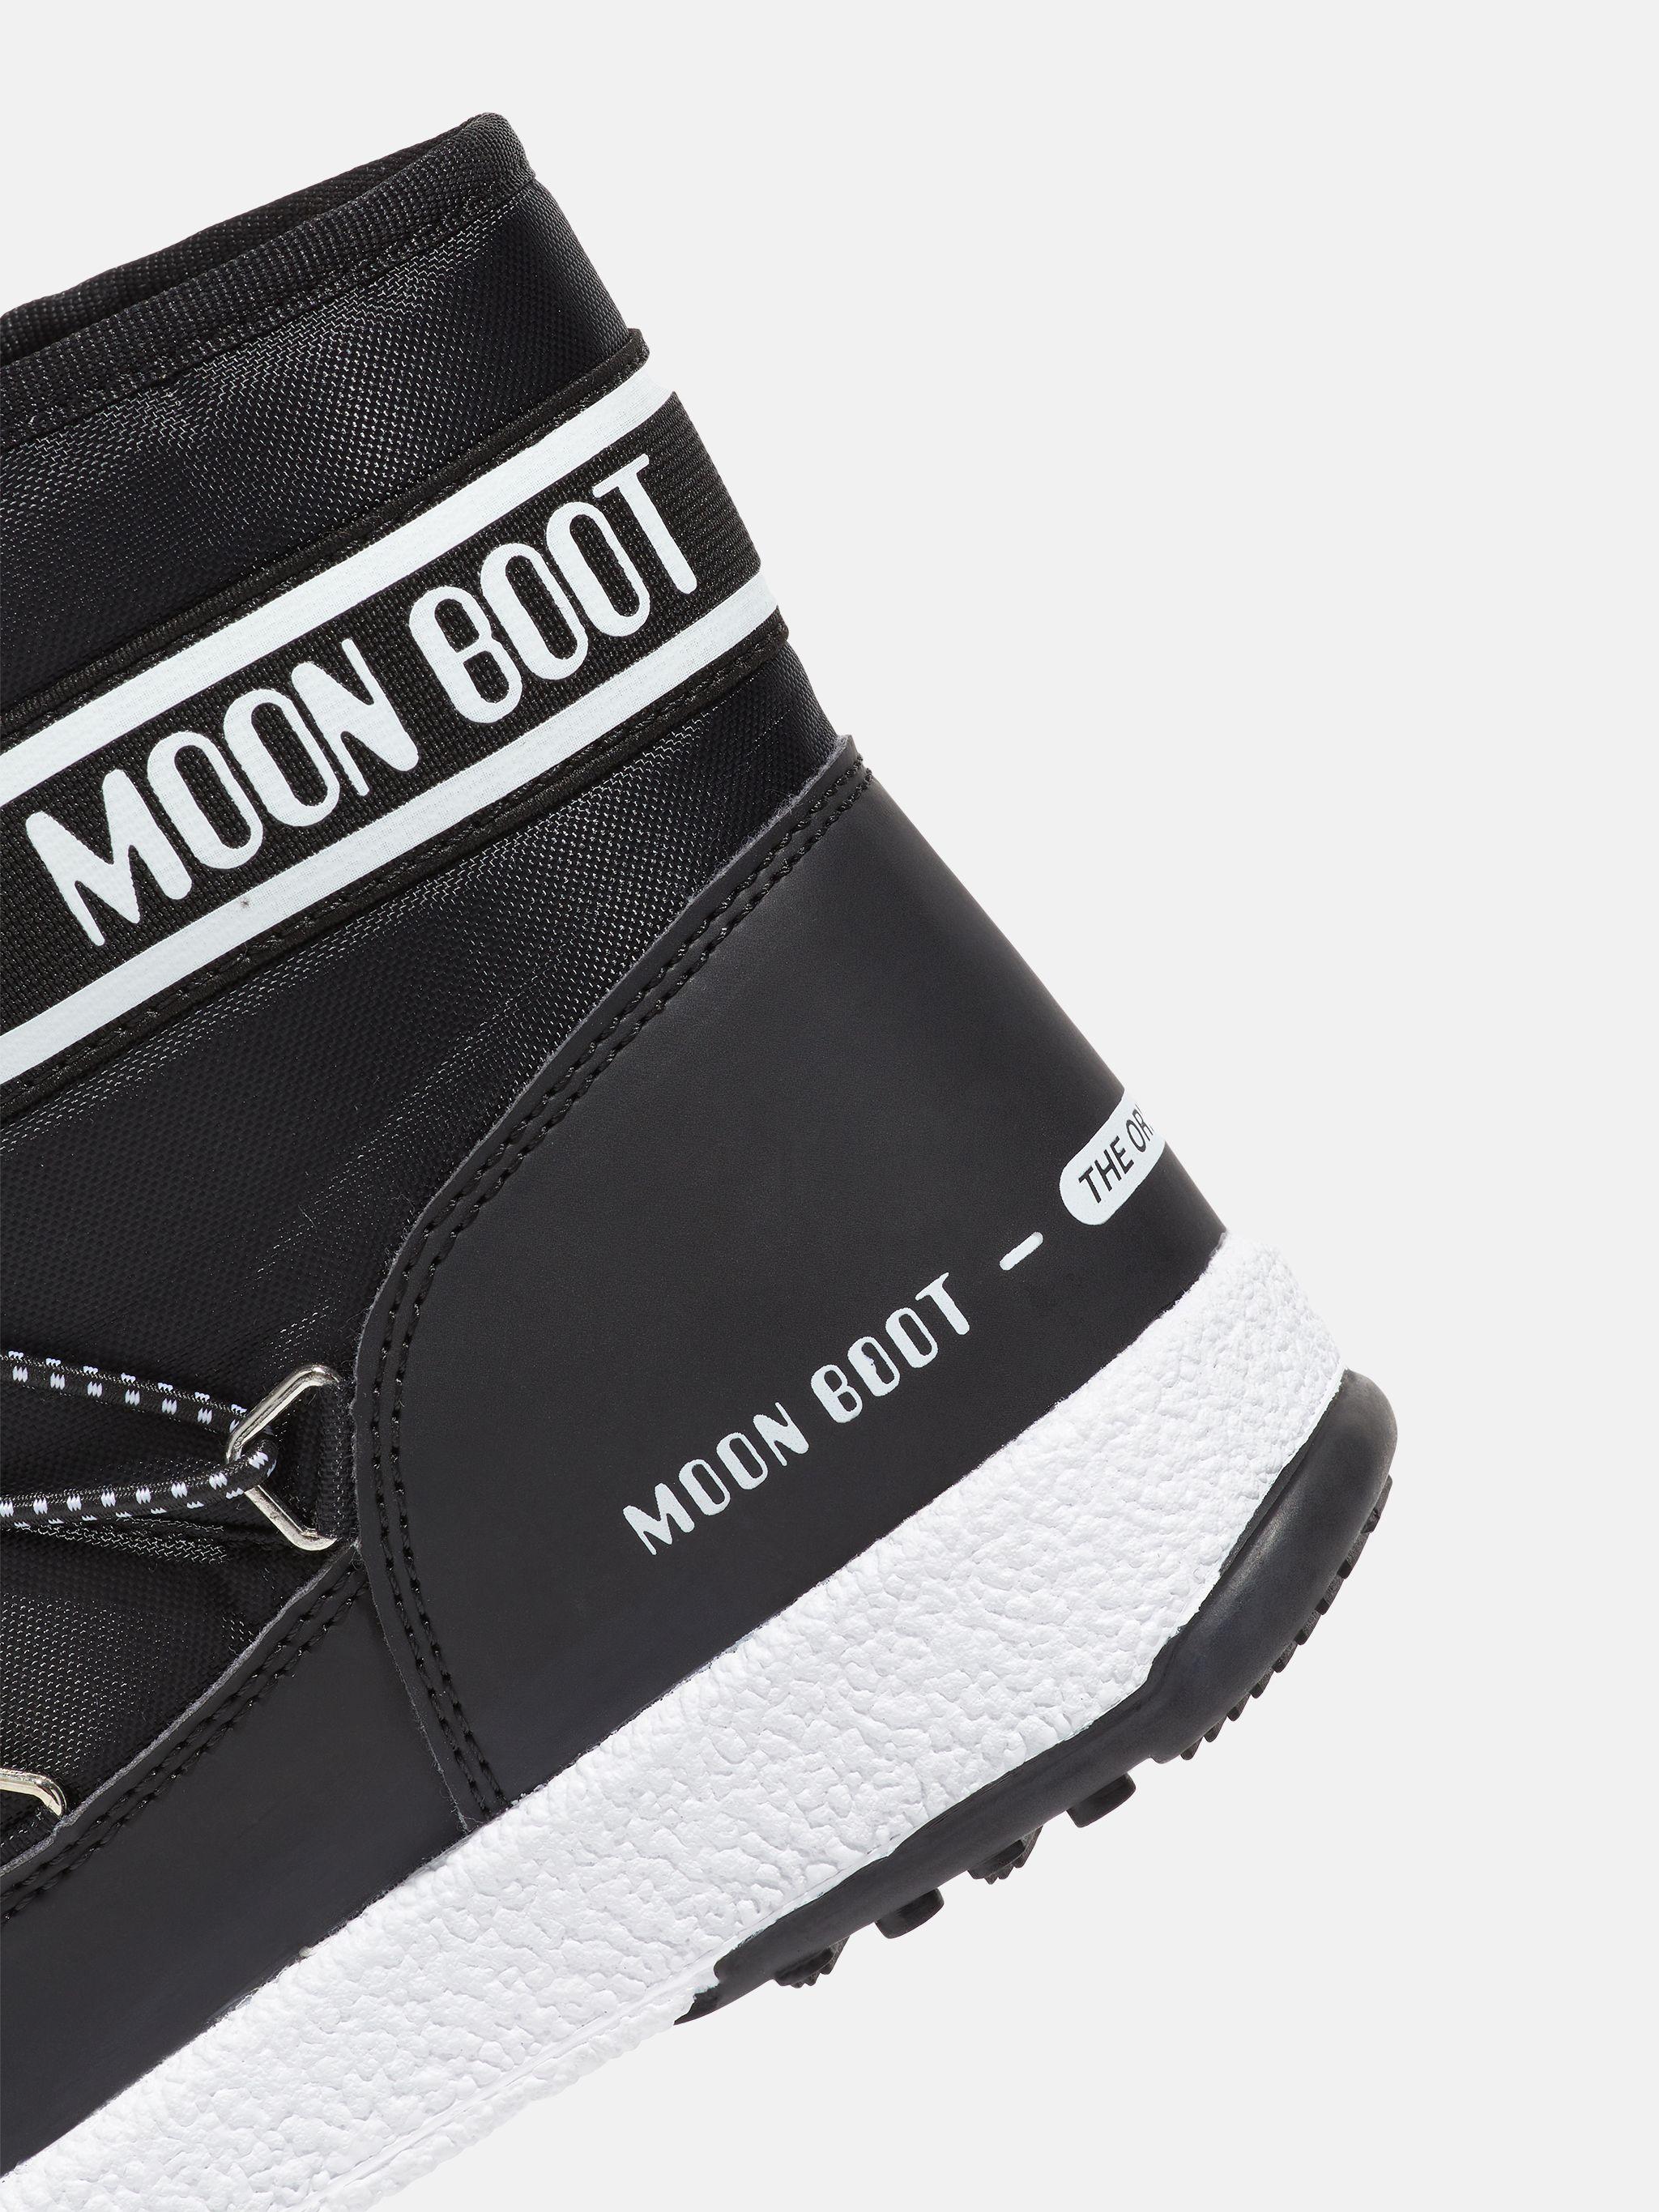 PROTECHT JUNIOR MID BLACK NYLON BOOTS